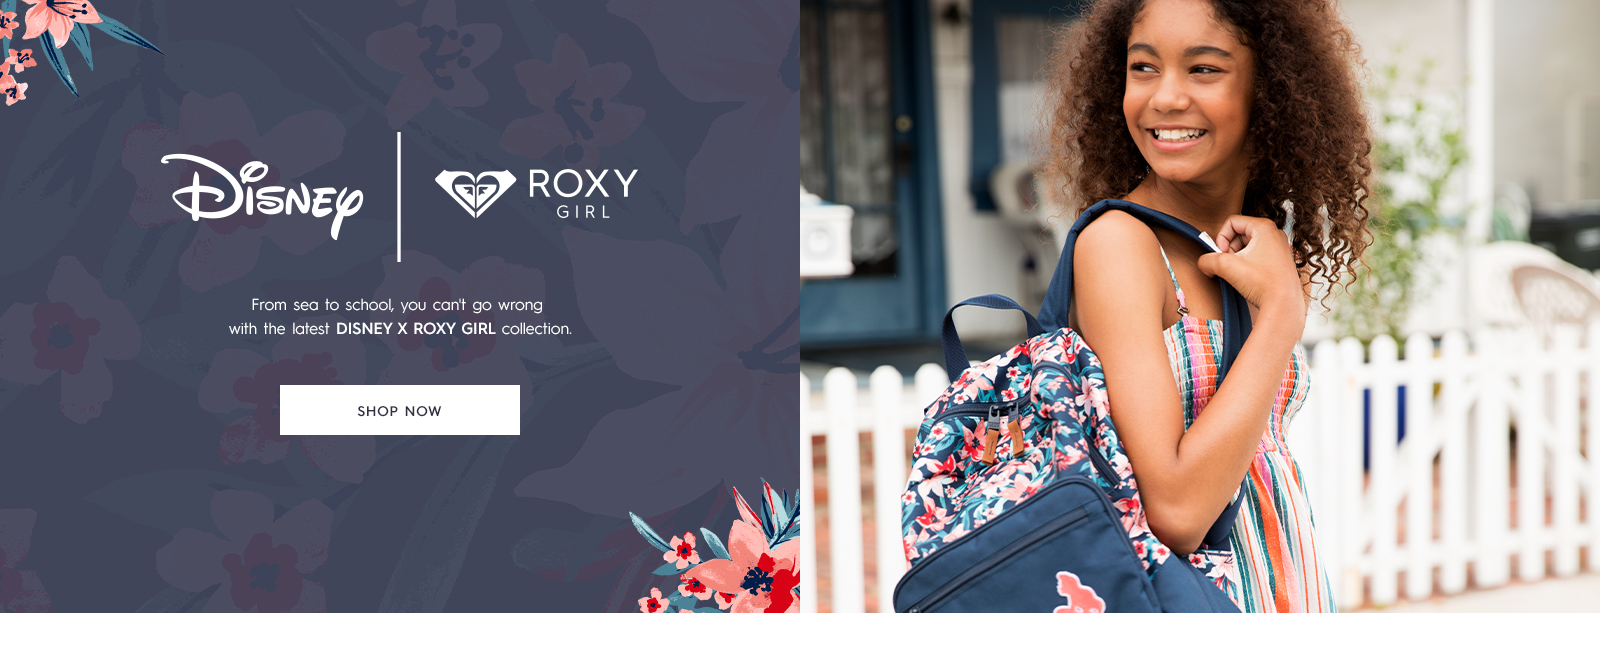 a7d7a46d91 Roxy | Surf, Snowboard & Fitness Brand - Women's Lifestyle